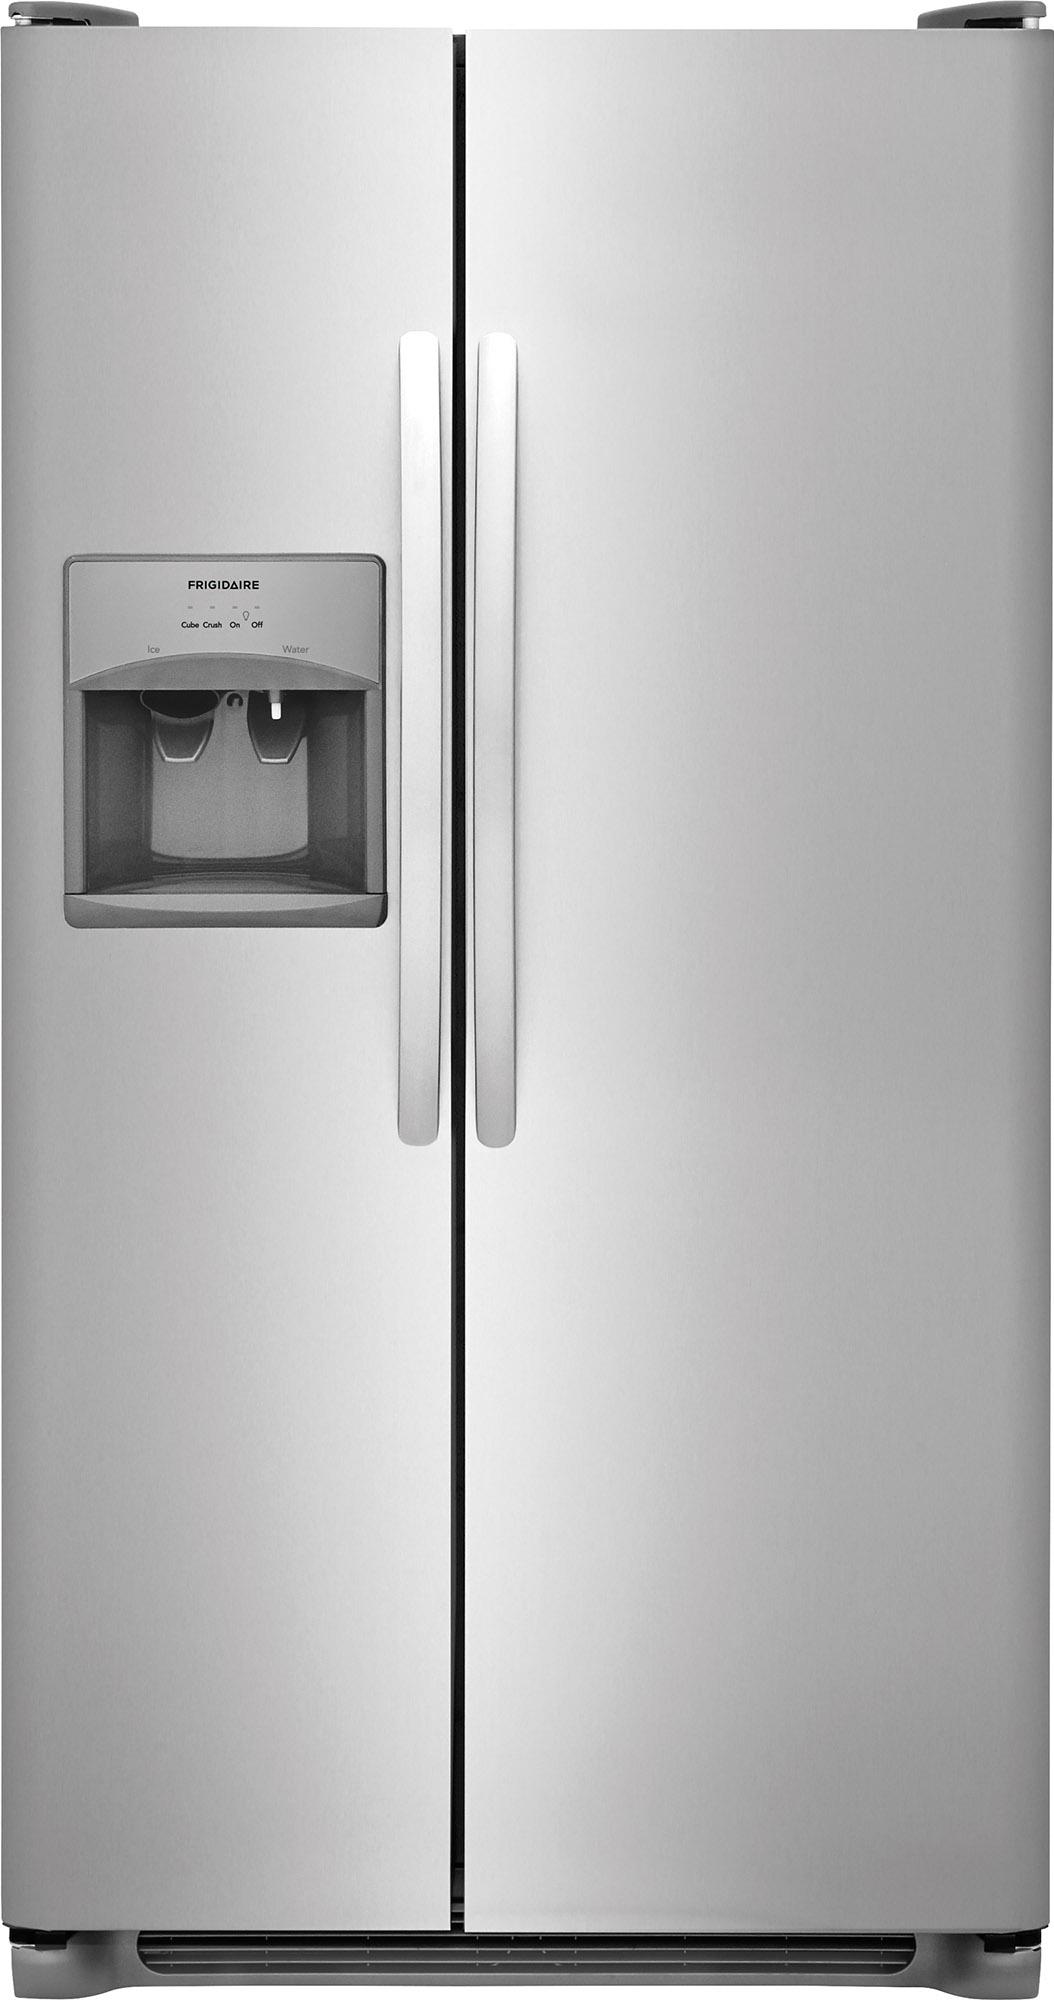 Frigidaire Refrigerator Model FFSS2315TS0 Parts